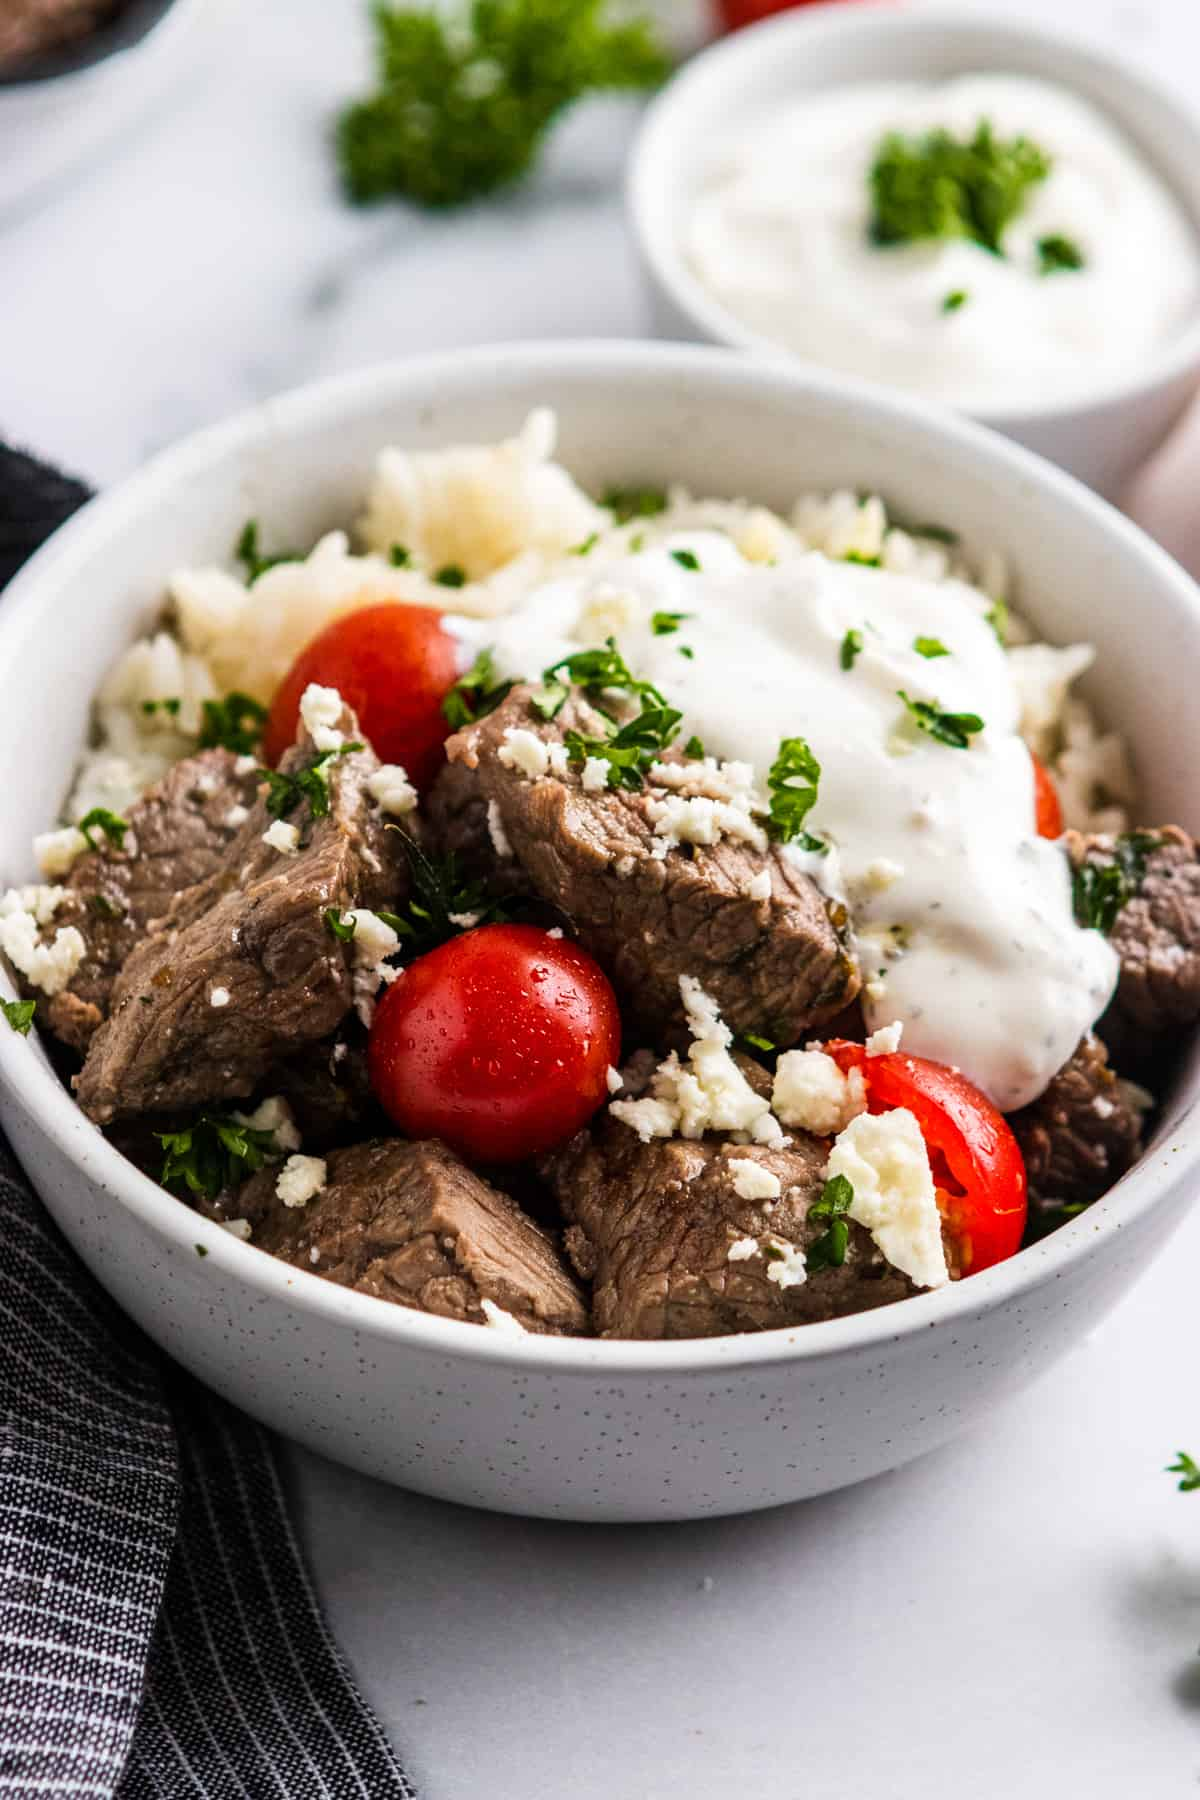 Rice bowl with steak, tomatoes, feta and yogurt dill sauce.